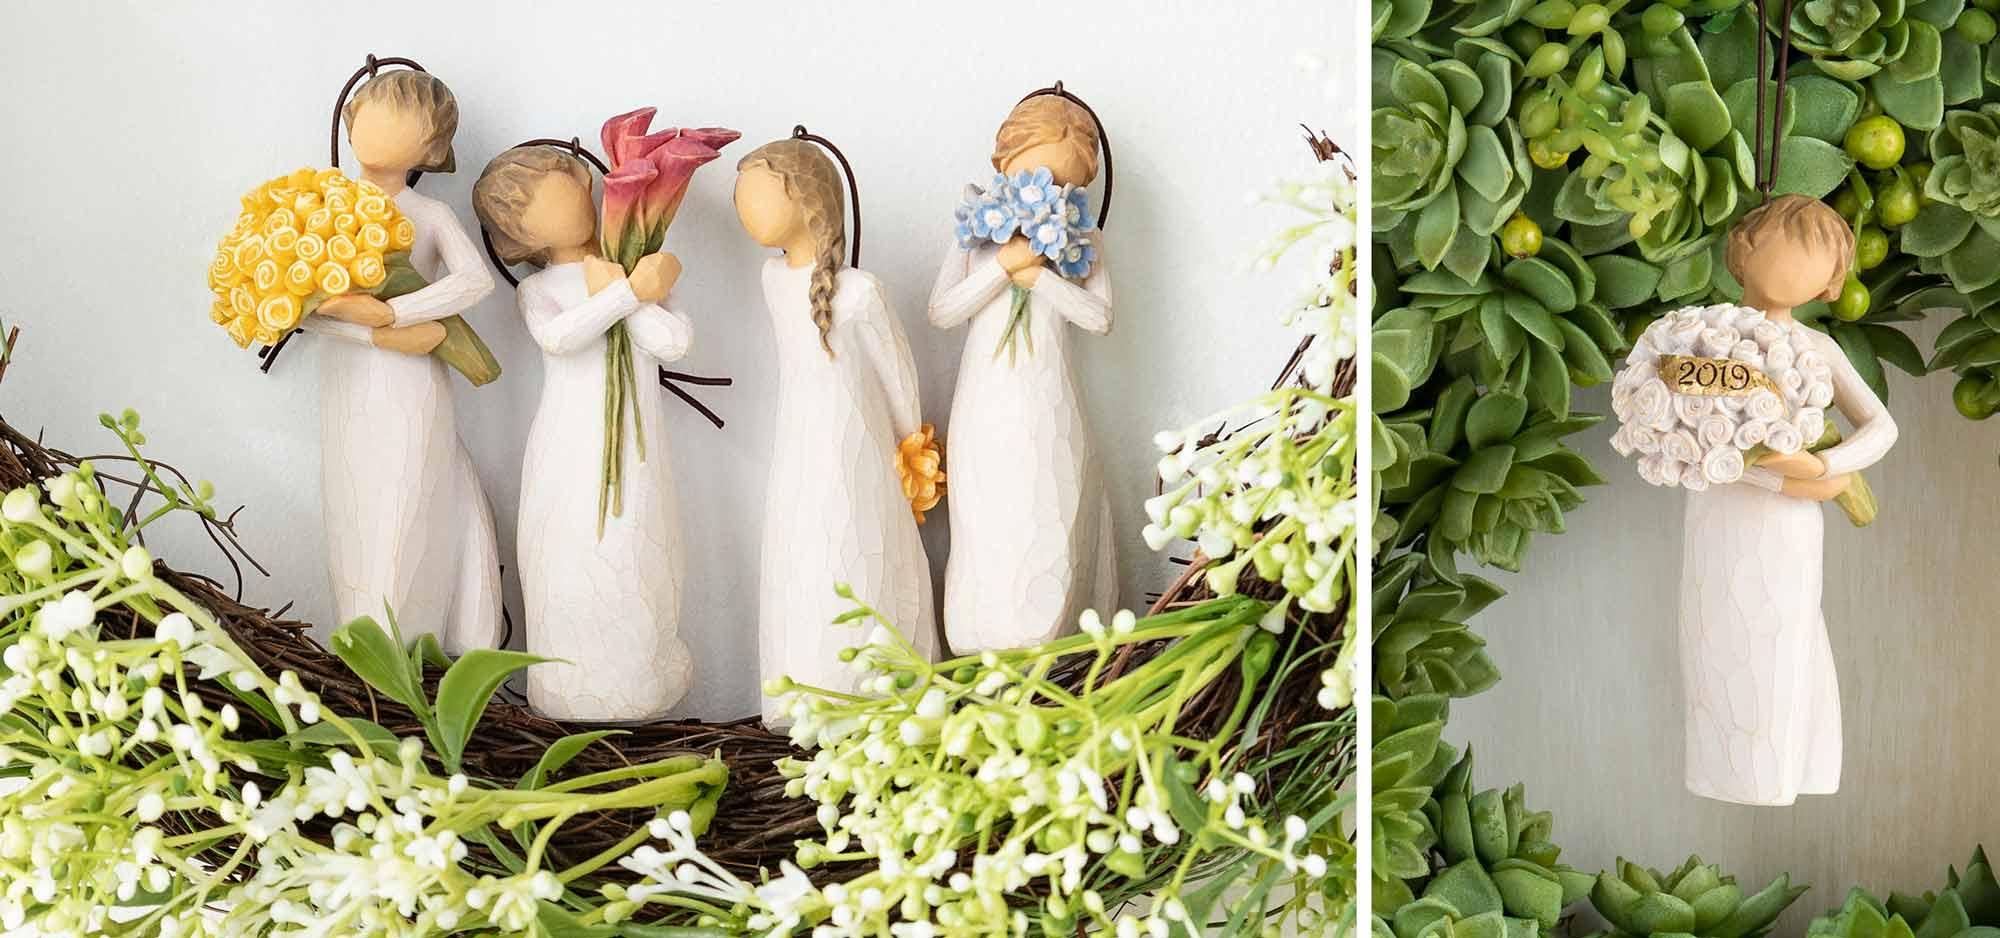 5 flower ornaments on green succulent wreaths